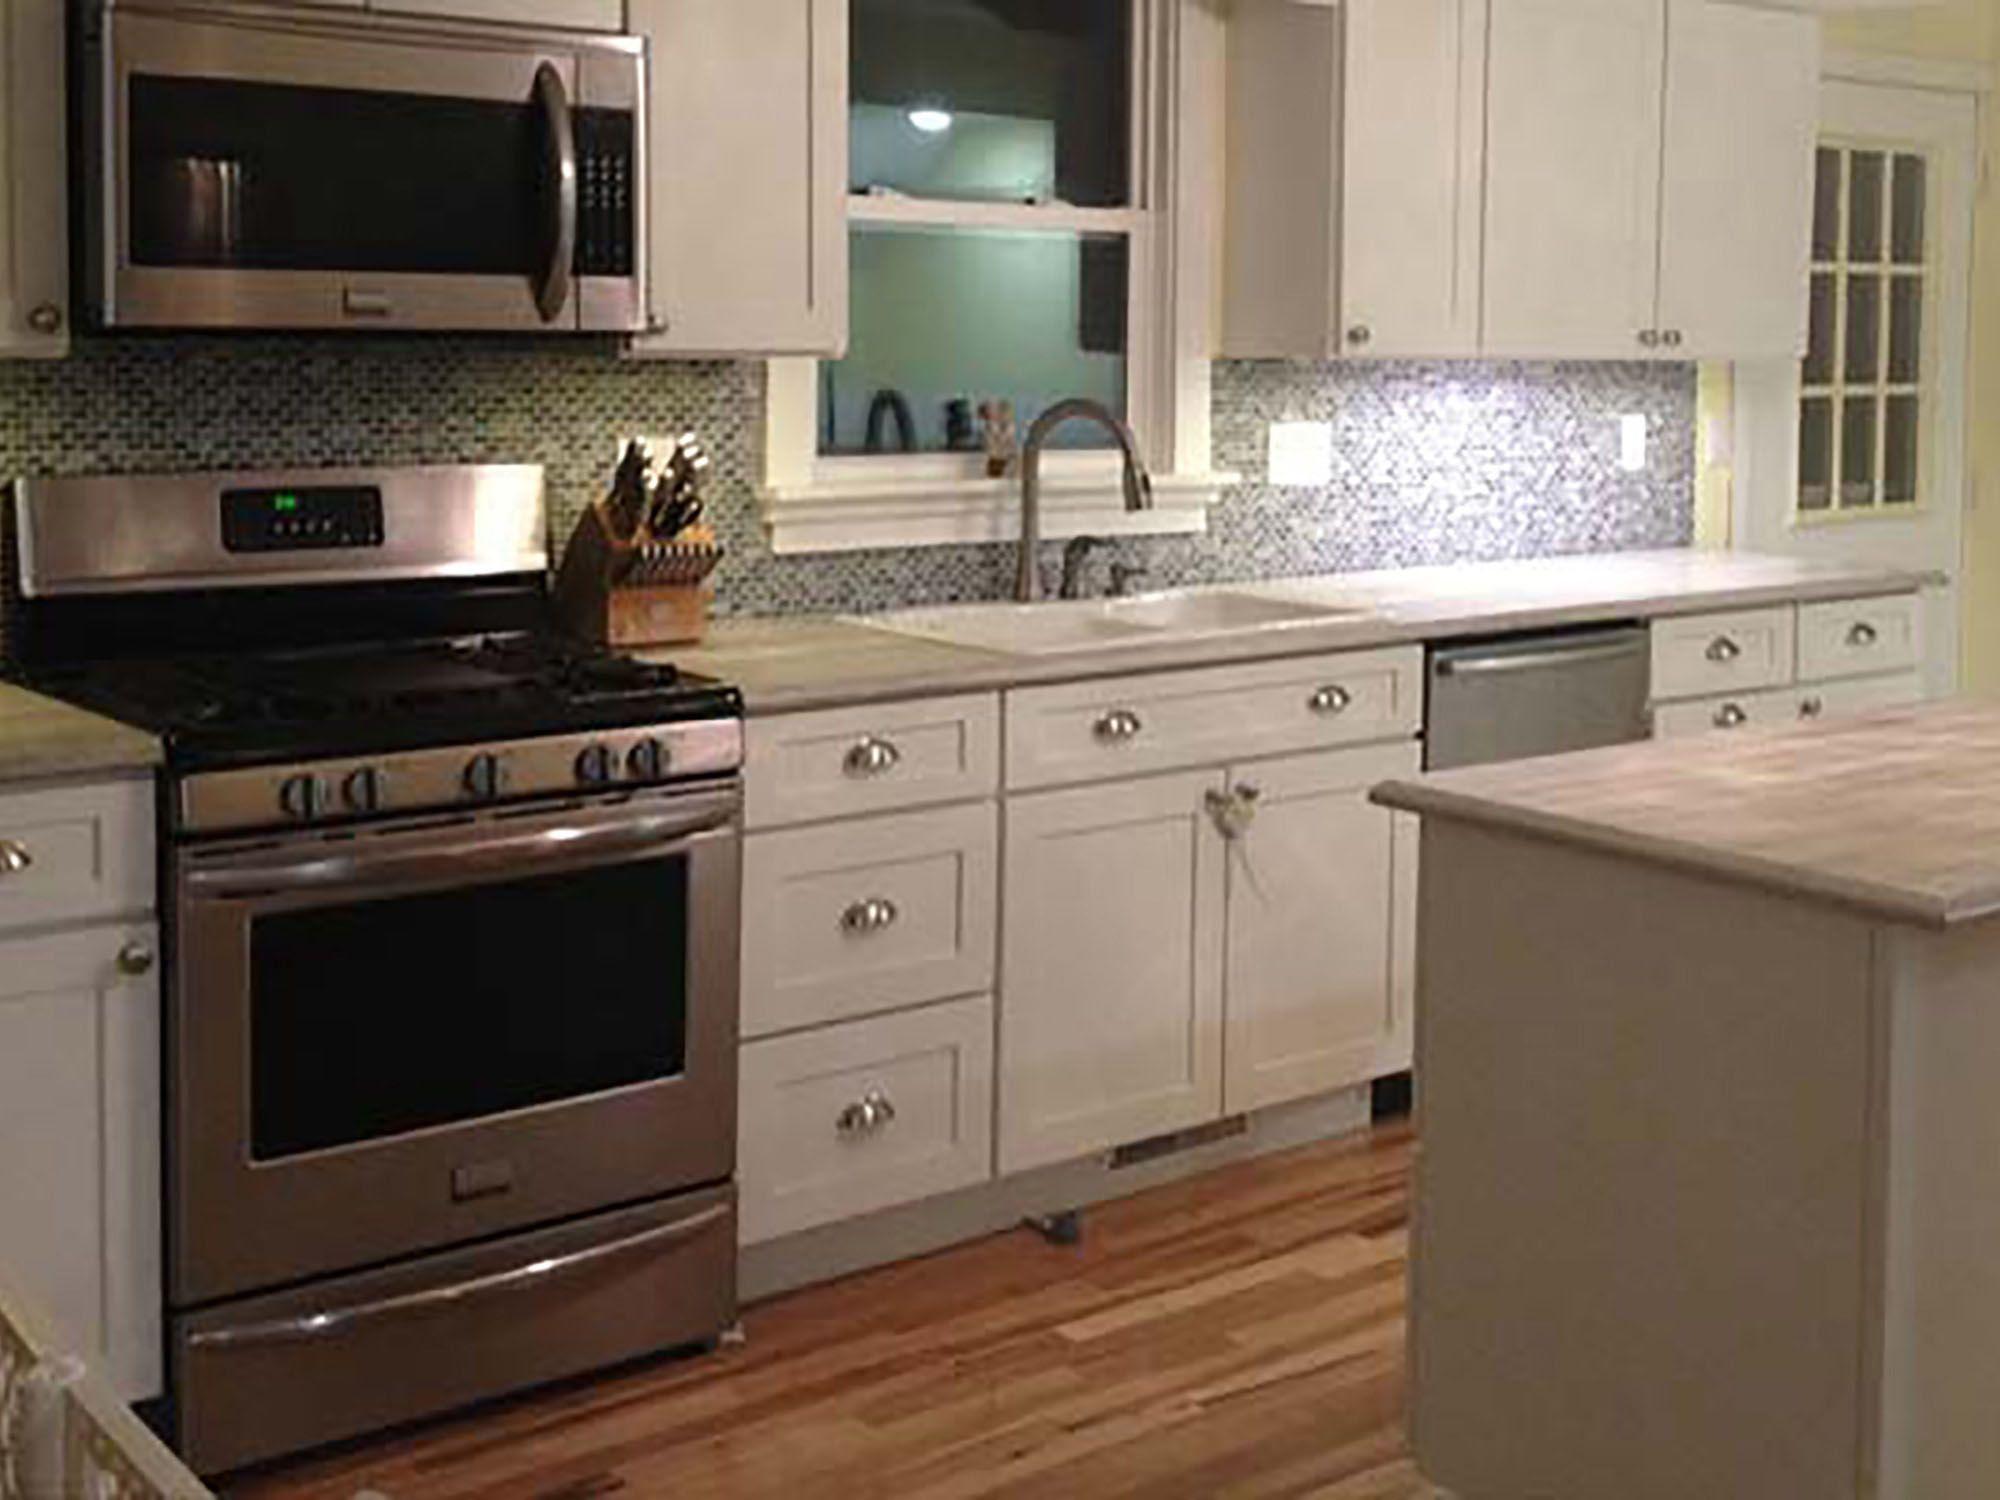 Kitchen Design Photo Gallery - CliqStudios Cabinets ...